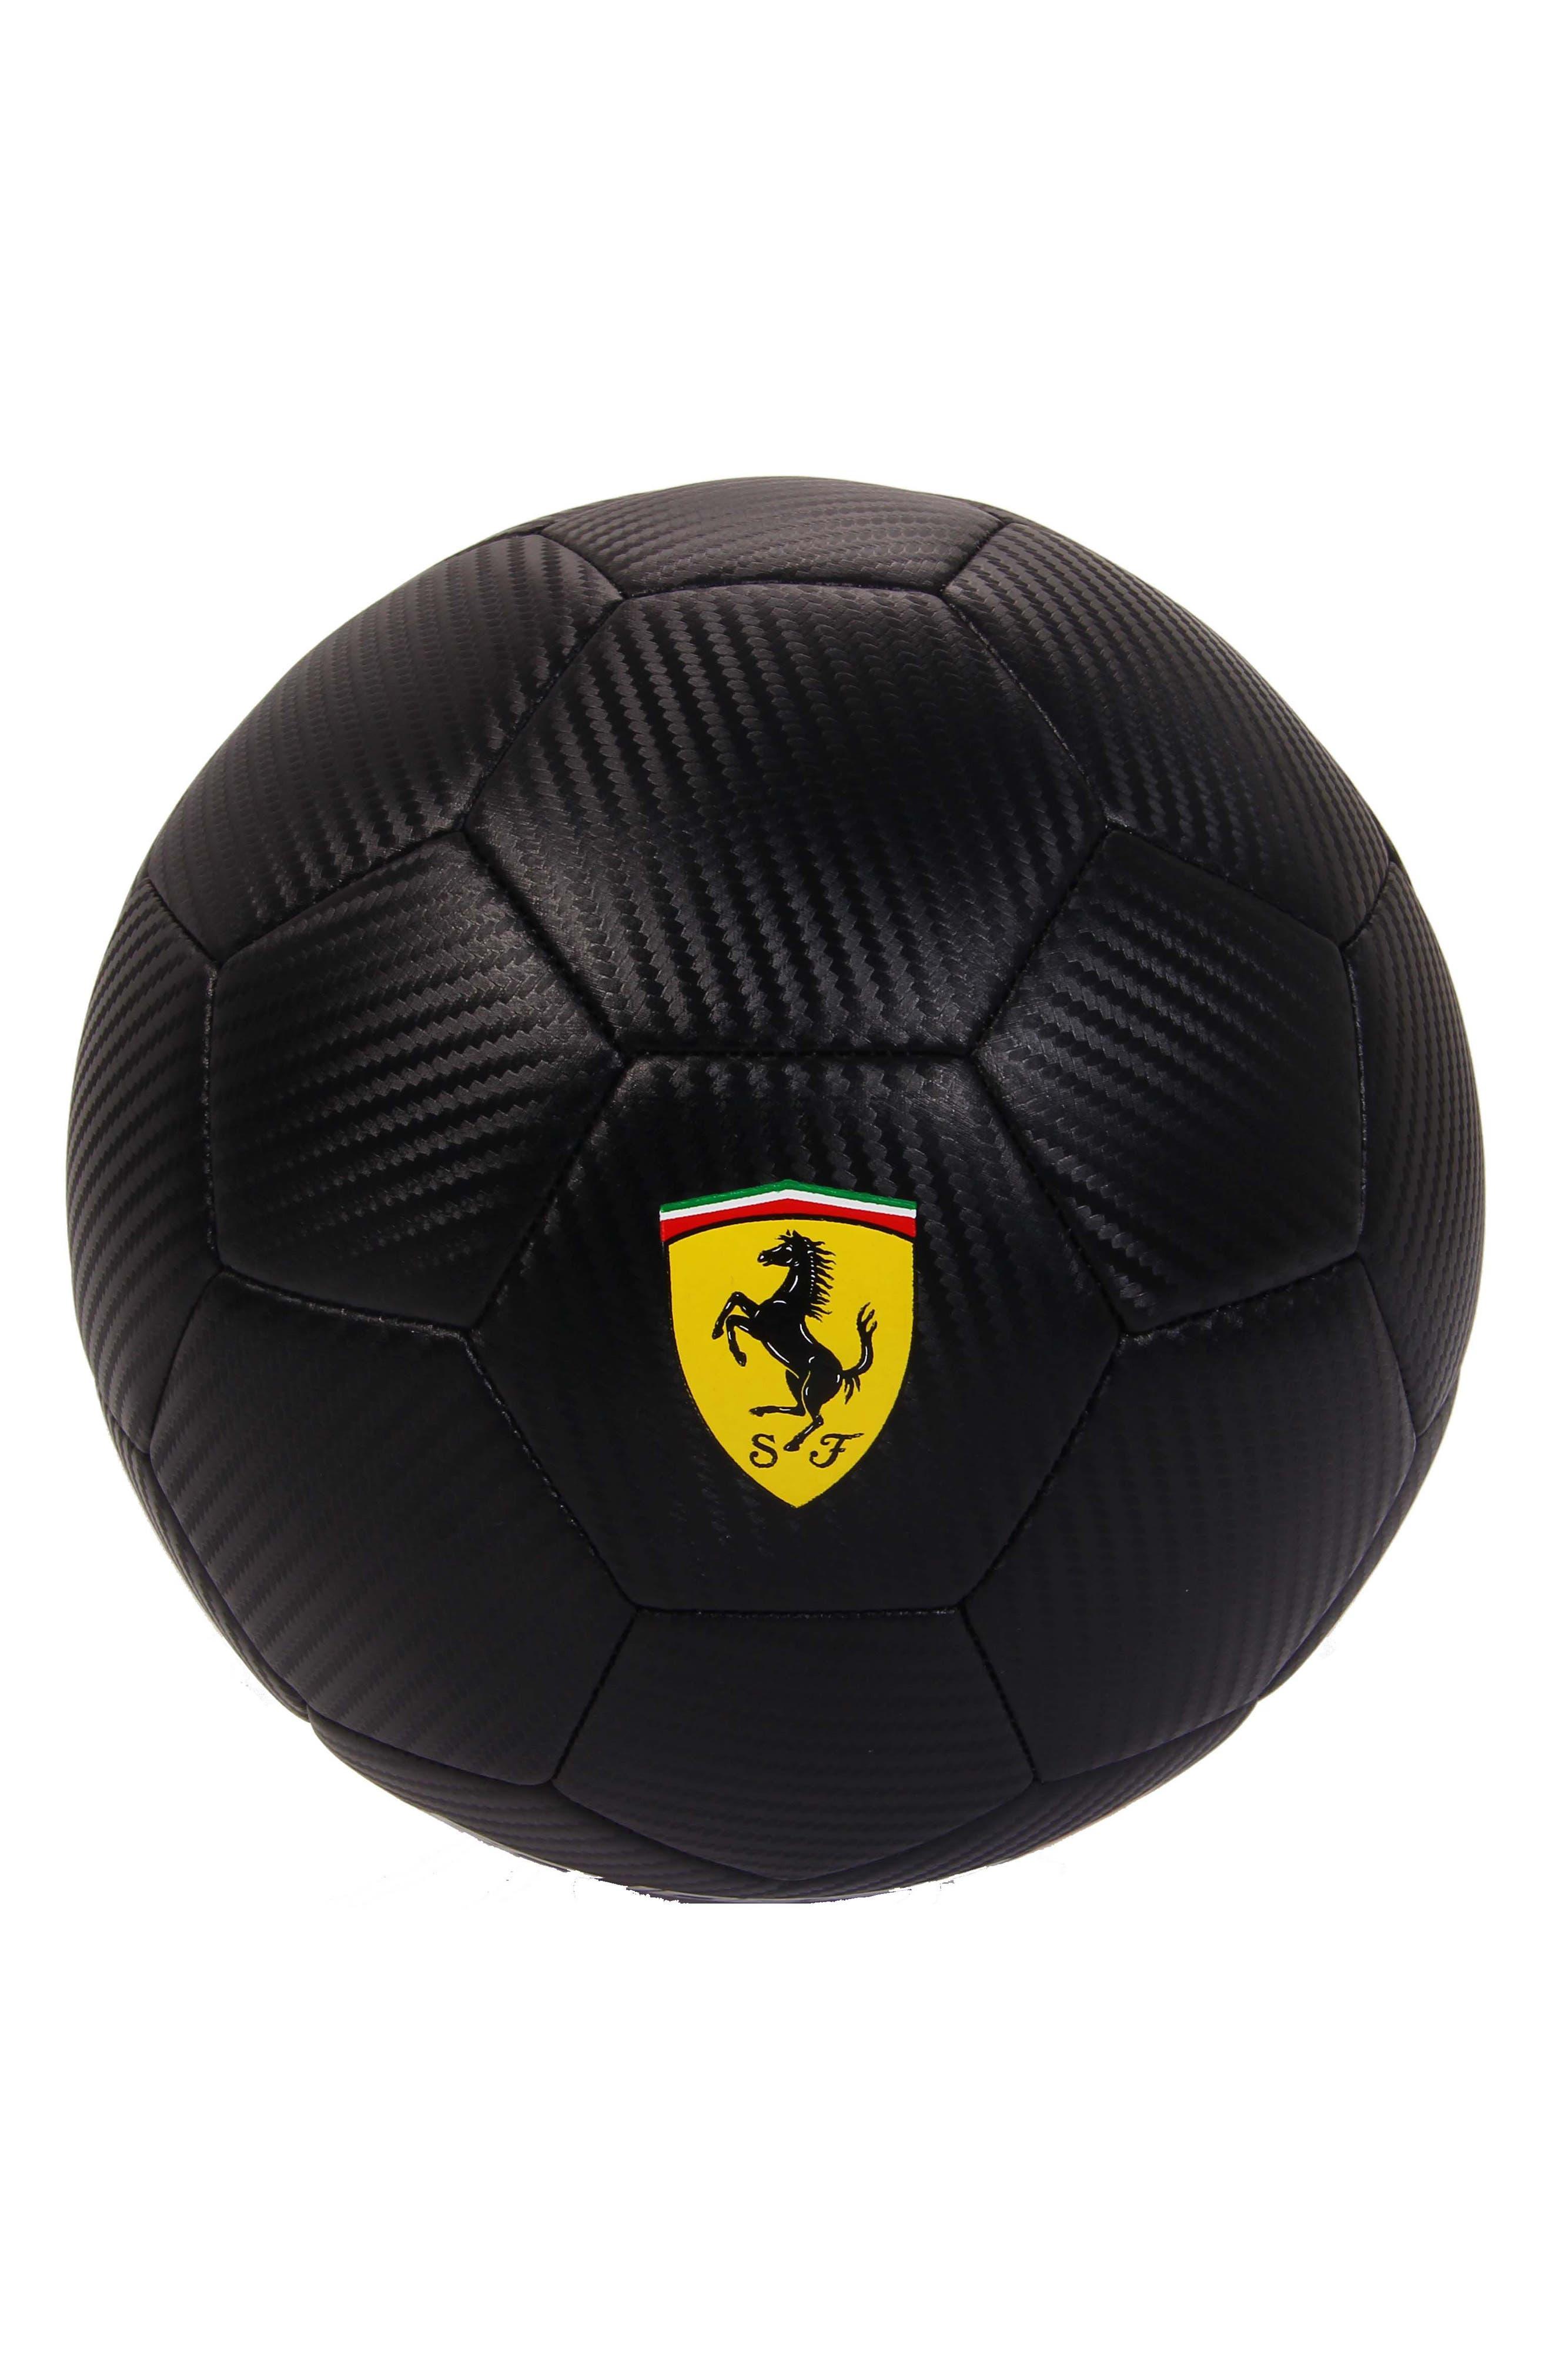 No. 2 Soccer Ball,                         Main,                         color, Black